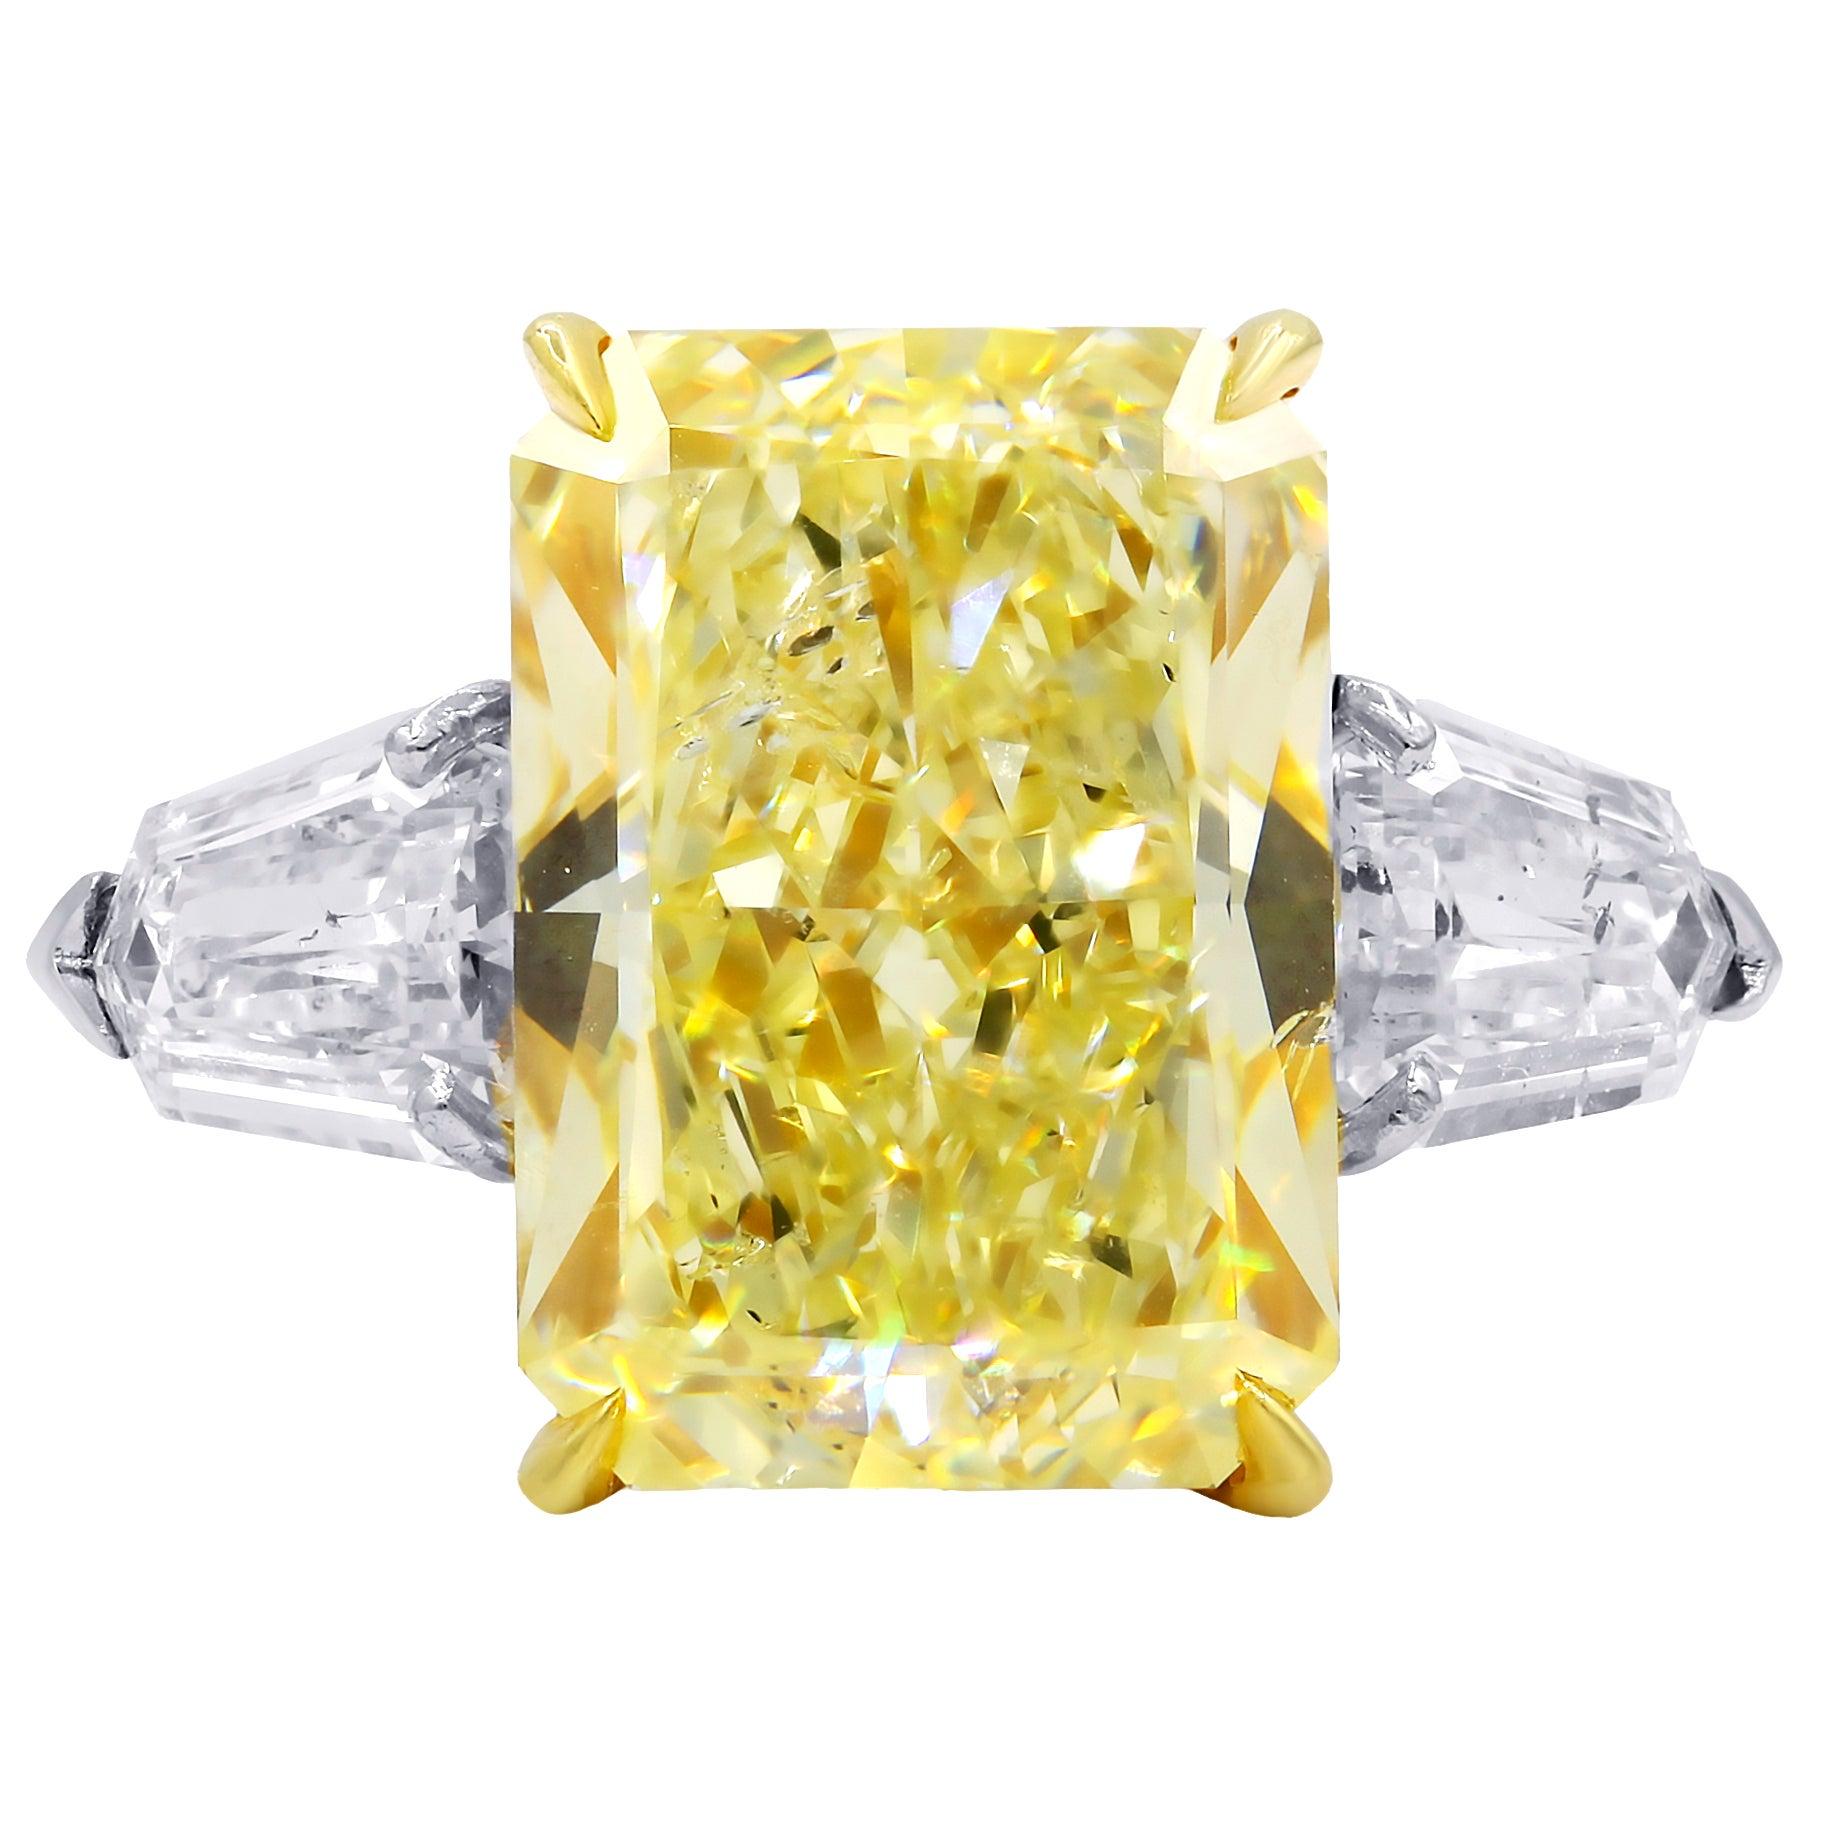 10.15 Carat Fancy Yellow Radiant Cut Diamond Ring, GIA